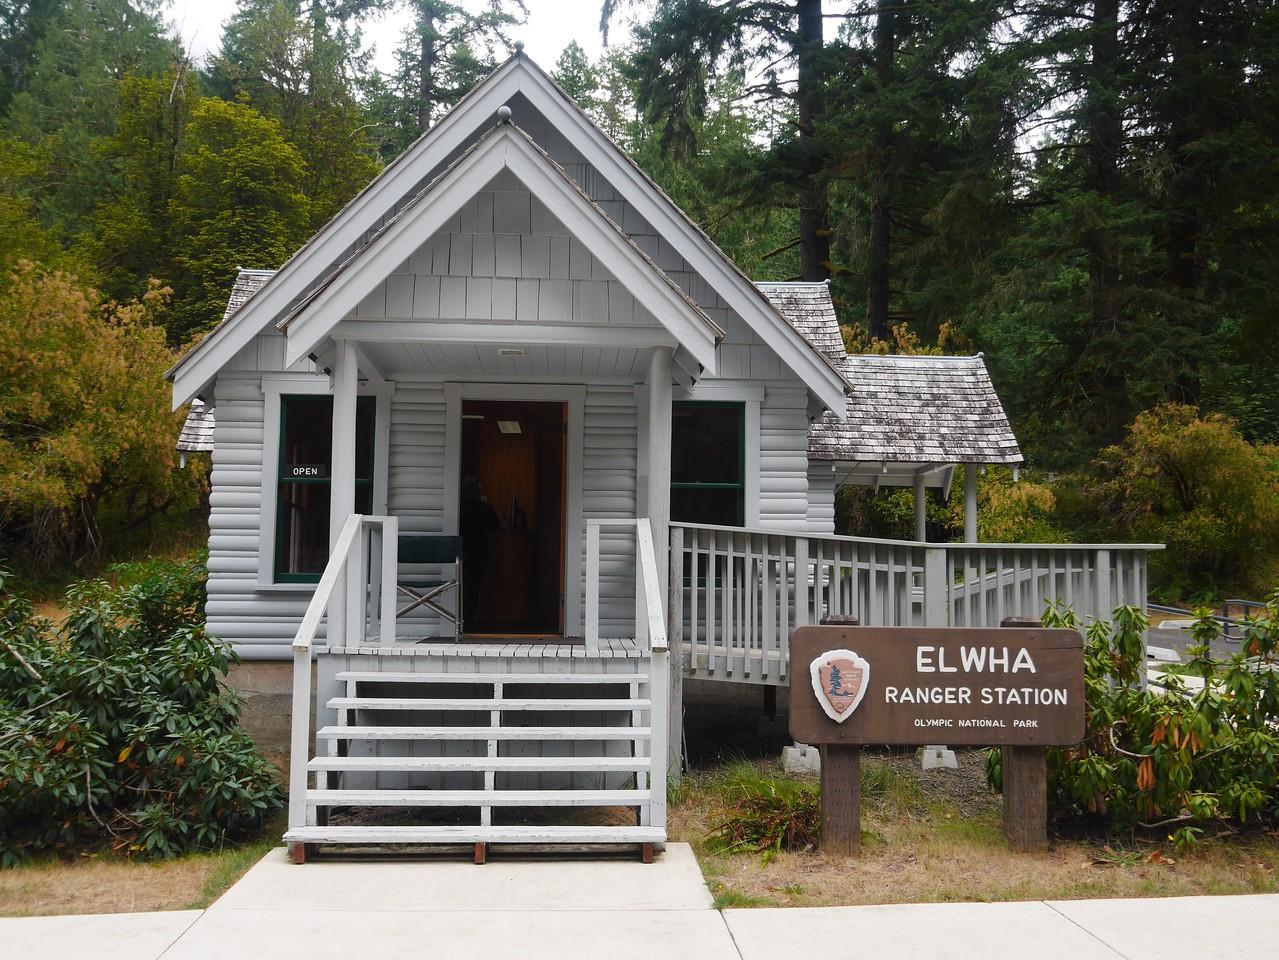 Olympic NP- Elwha Ranger Station